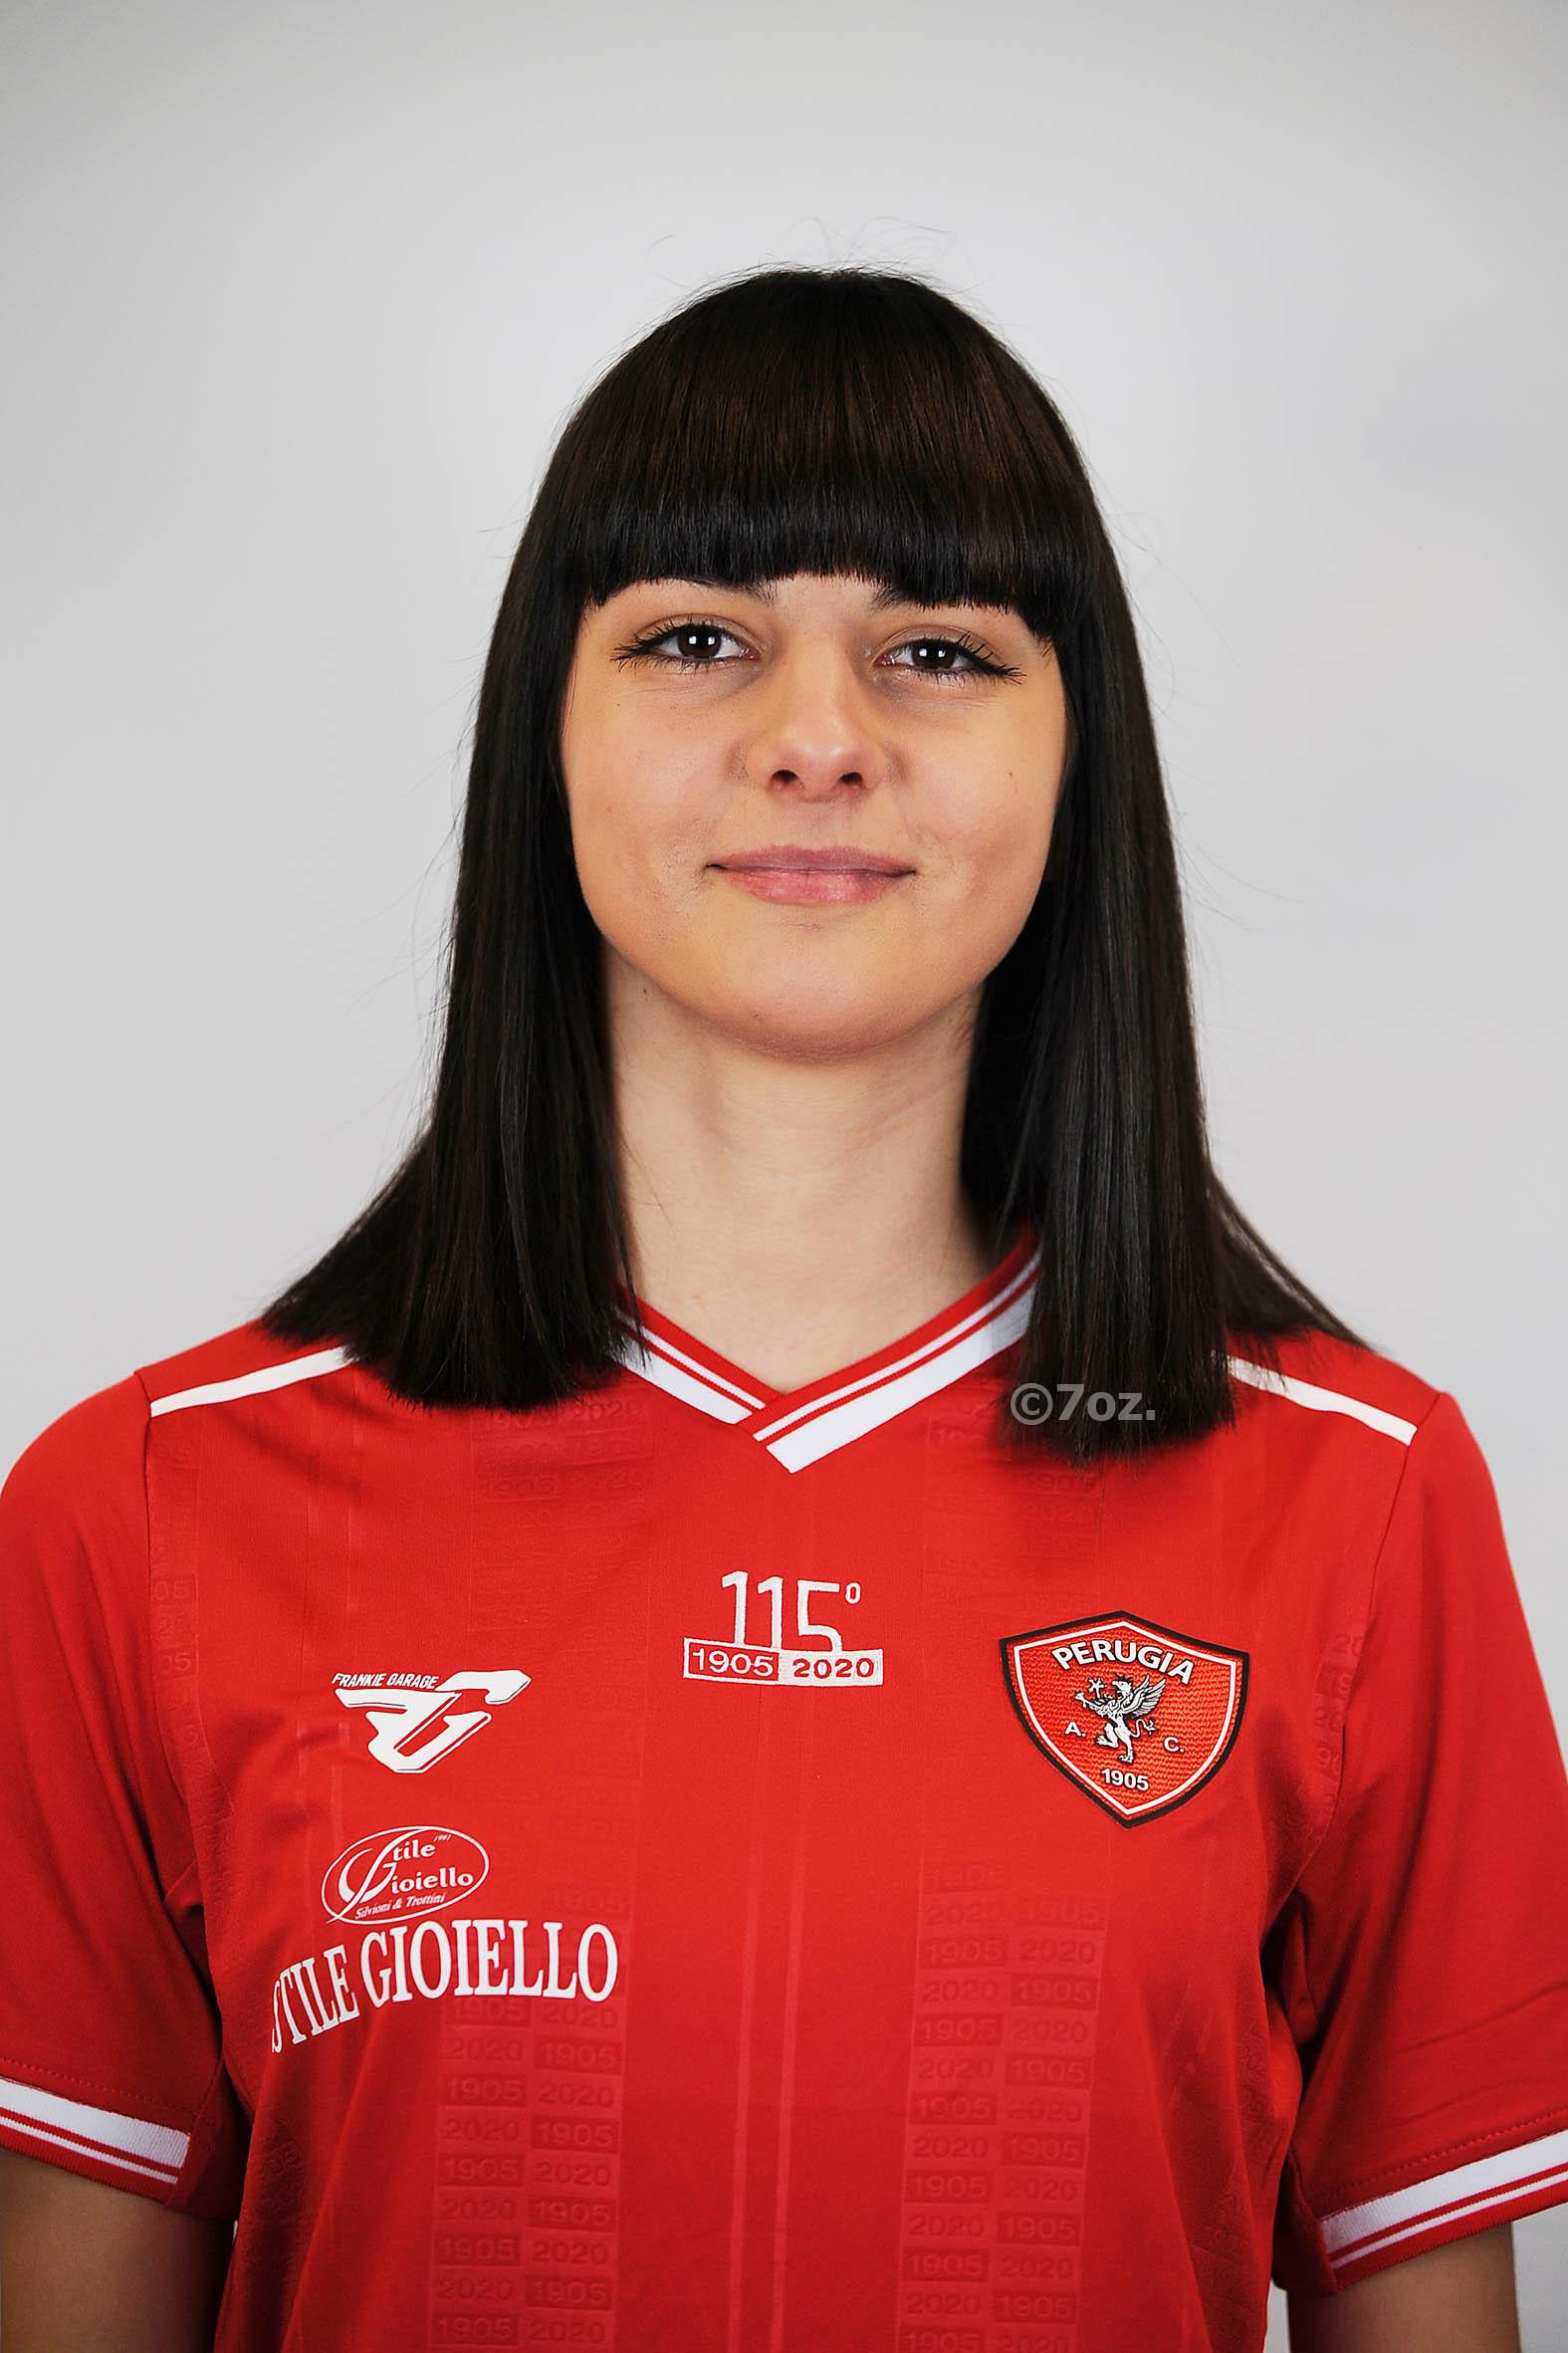 Michela AngoriCentrocampista- A.C. Perugia Calcio